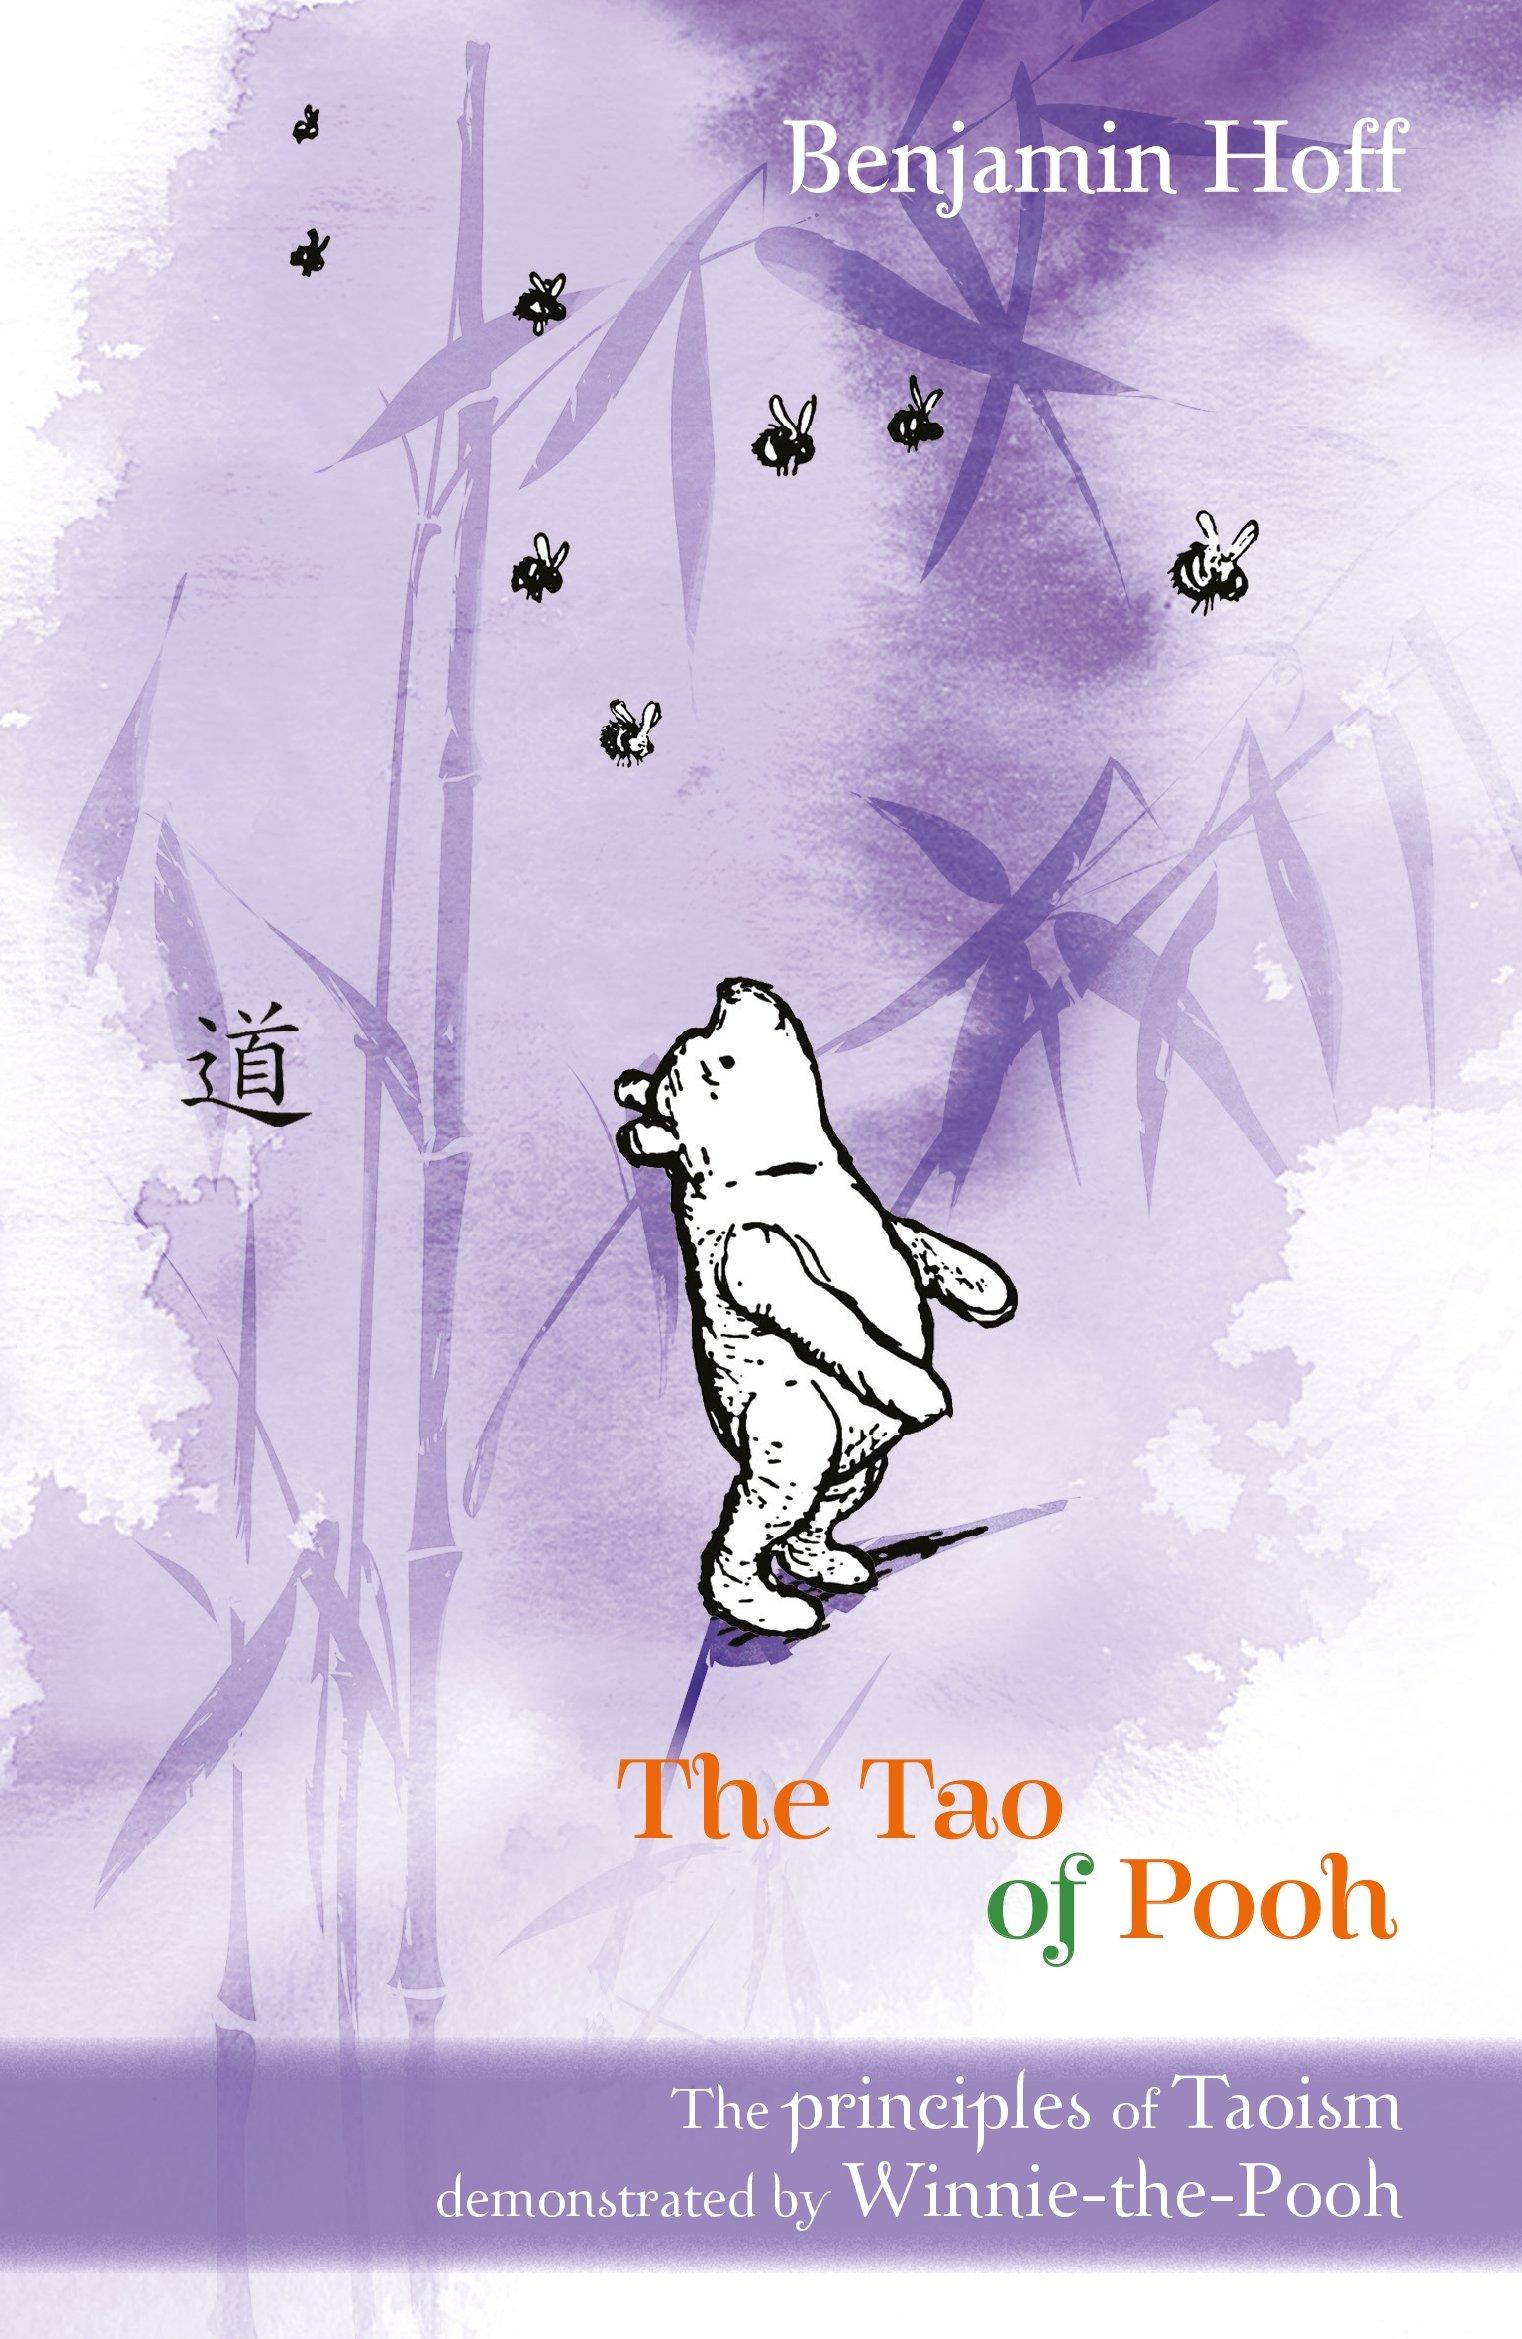 The Tao of Pooh (Winnie-The-Pooh)